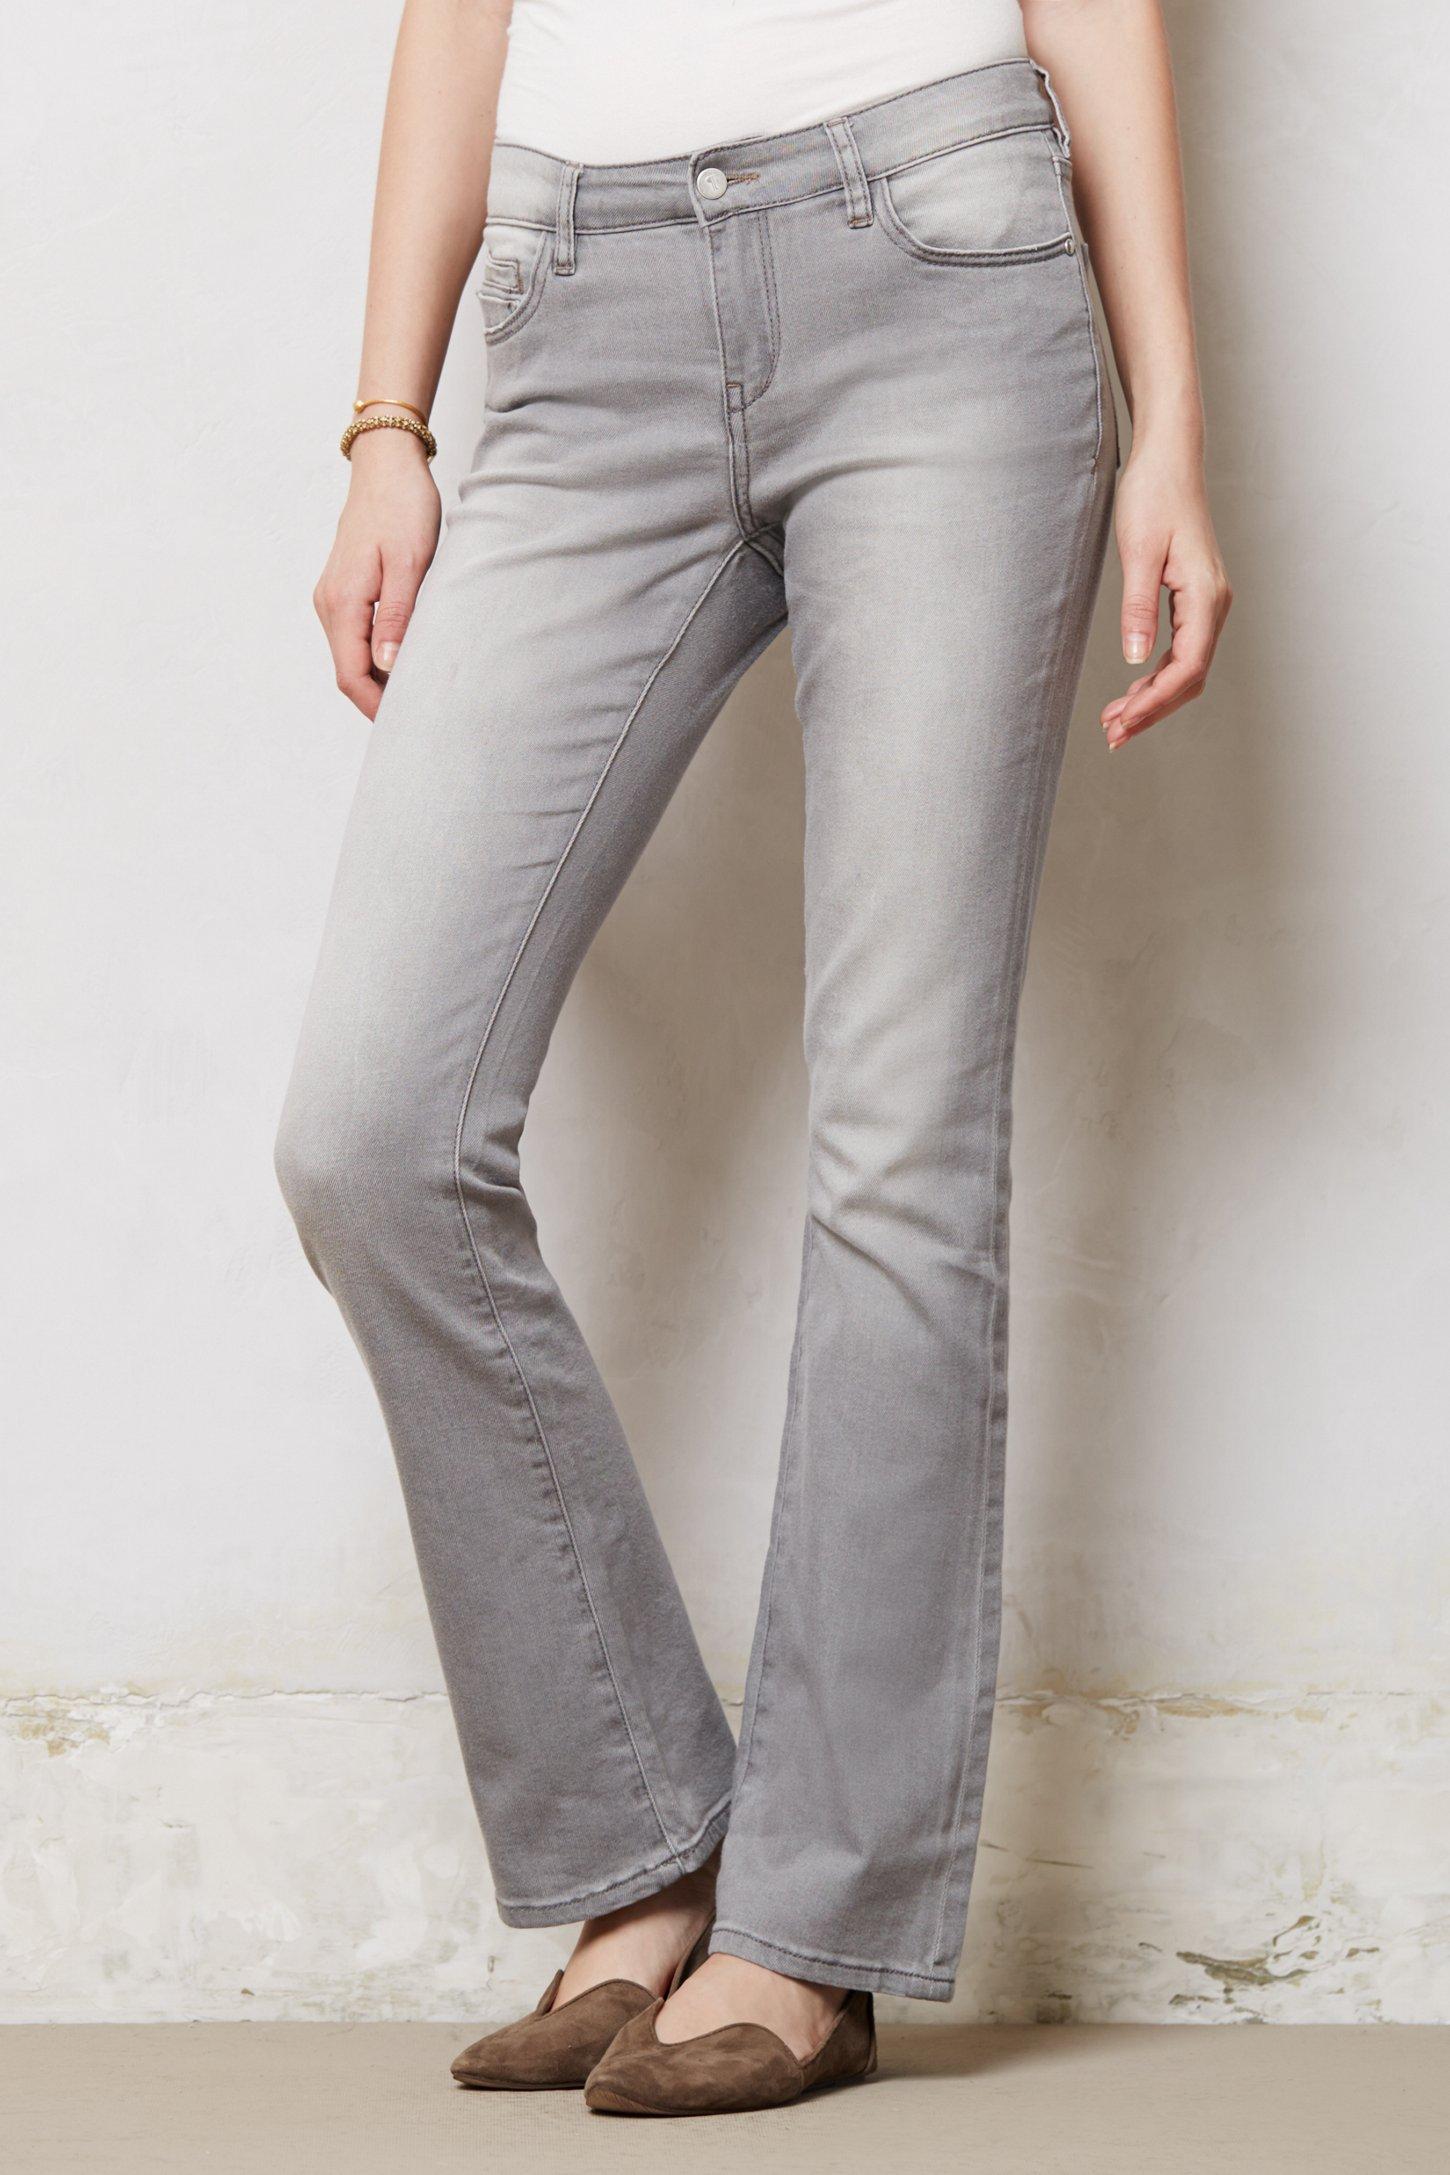 Pilcro Pilcro Stet Slim Bootcut Jeans in Gray | Lyst